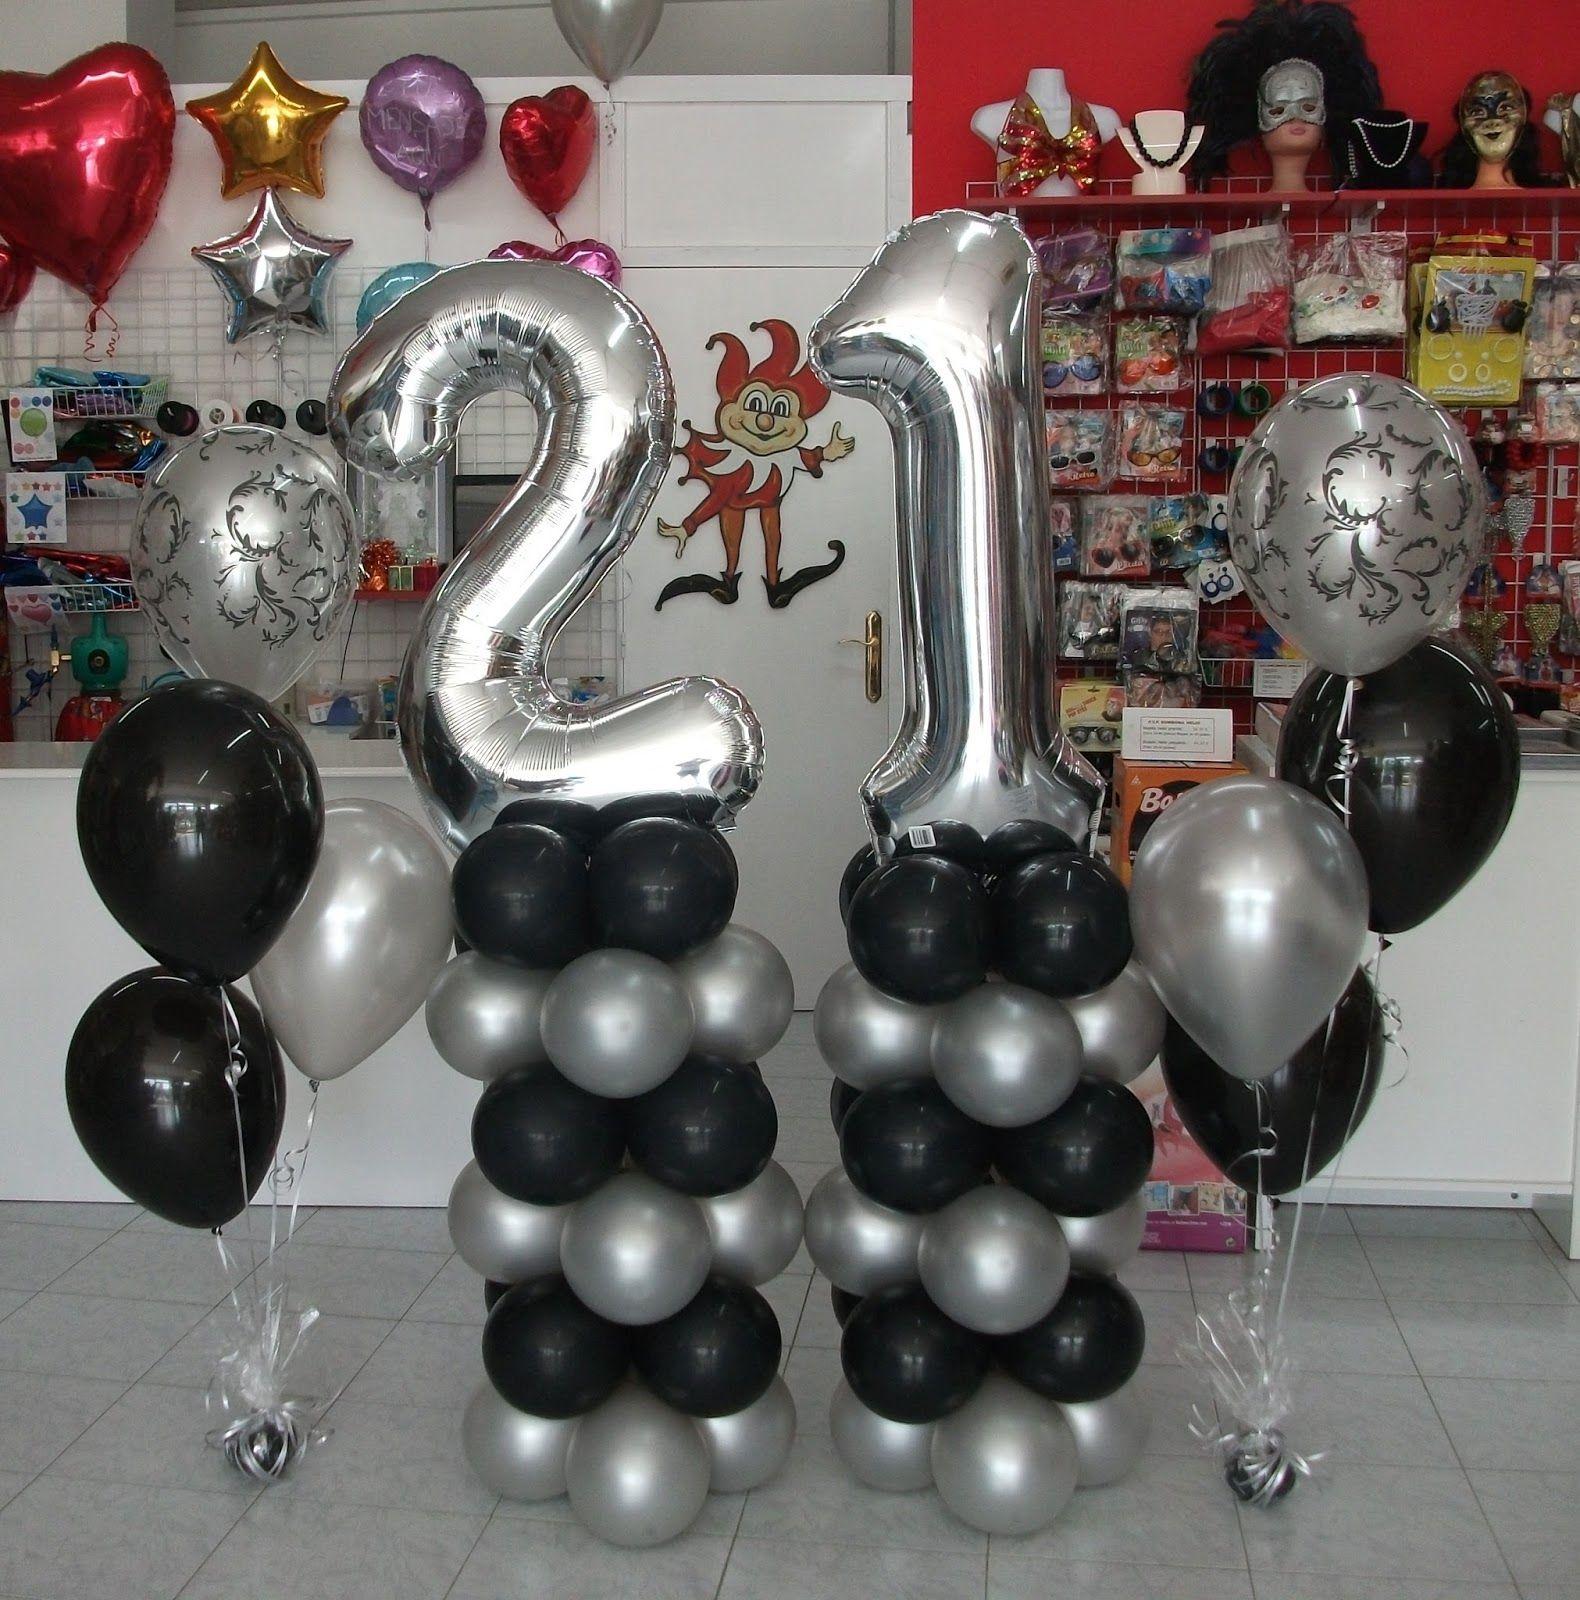 Decoracion Para Fiesta De 21 Anos 1 Jpg 1580 1600 Decoracion